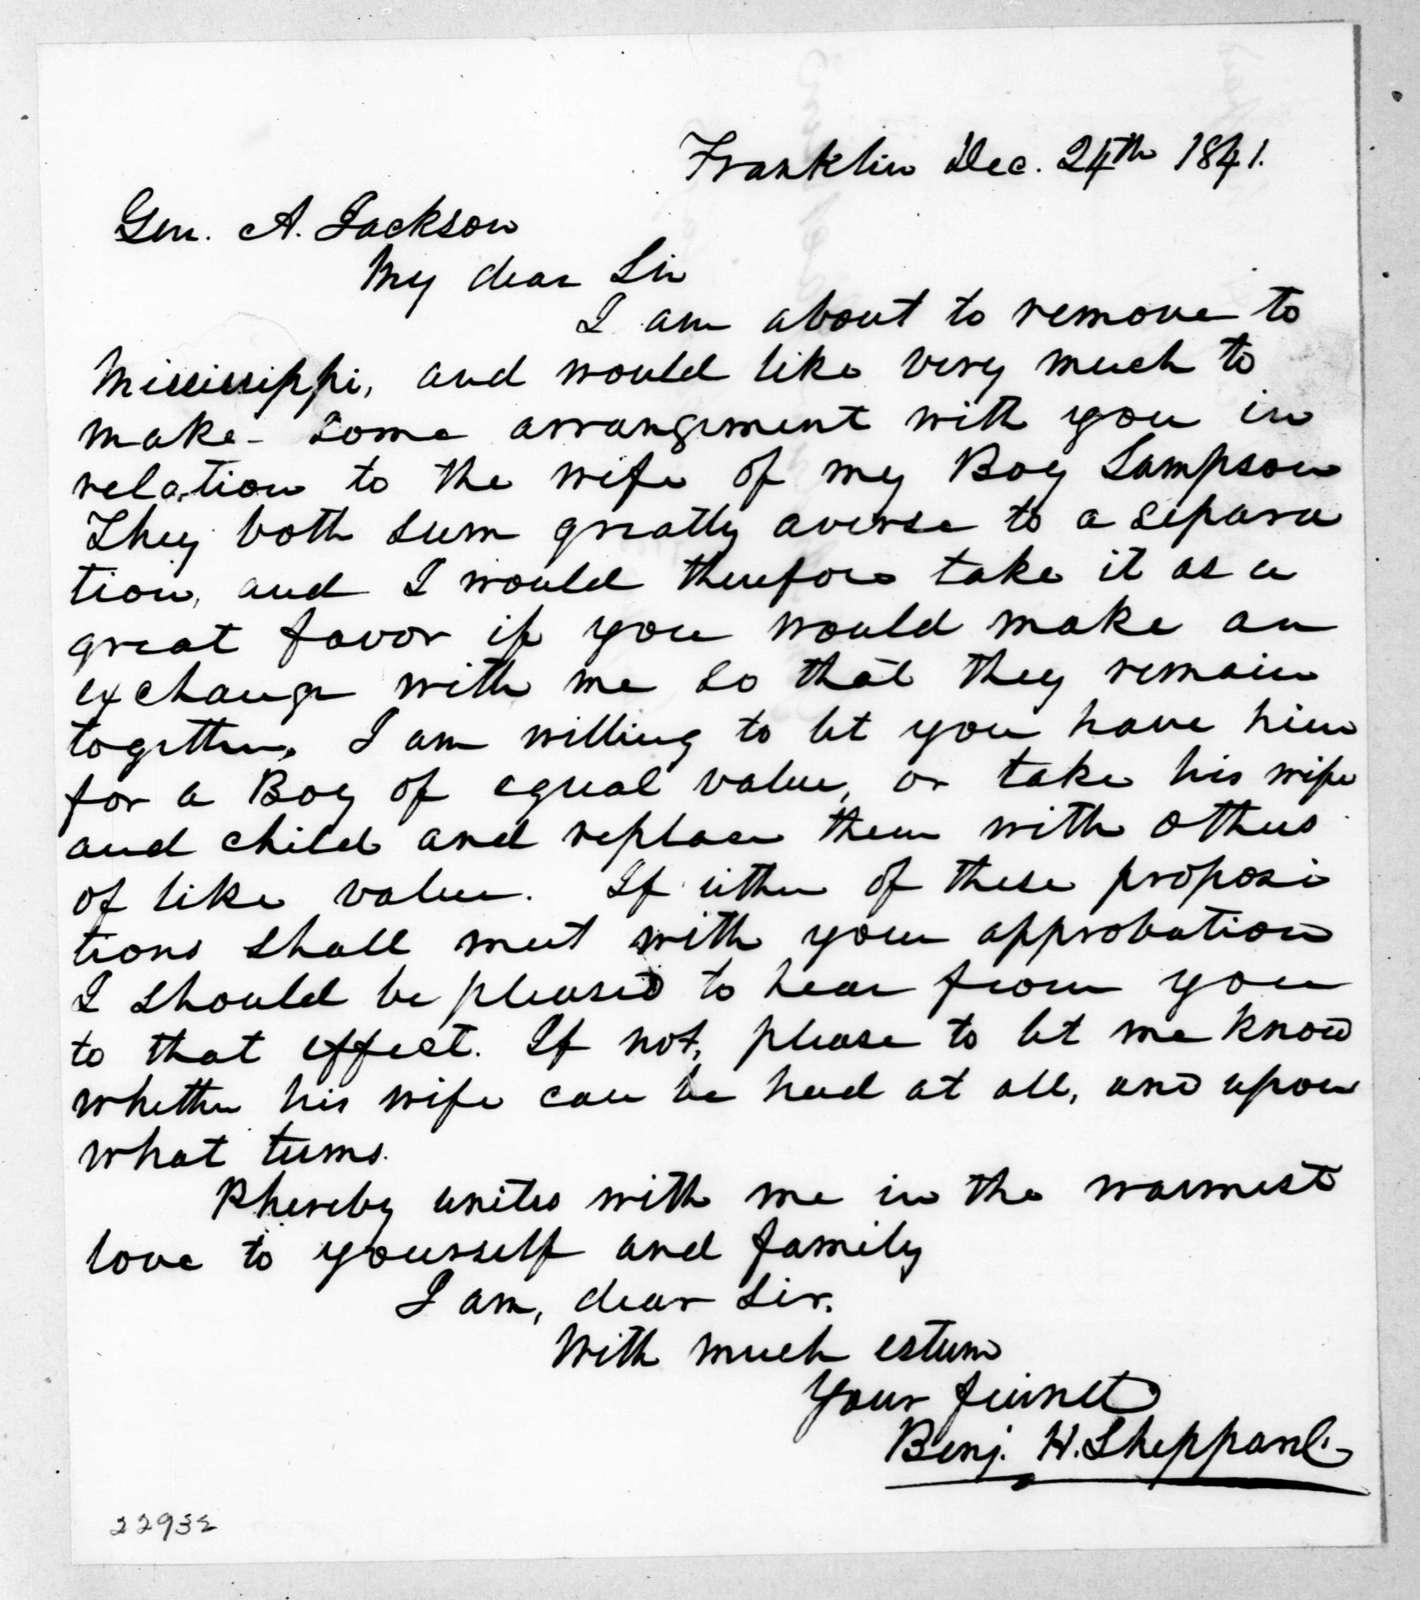 Benjamin H. Sheppard to Andrew Jackson, December 24, 1841